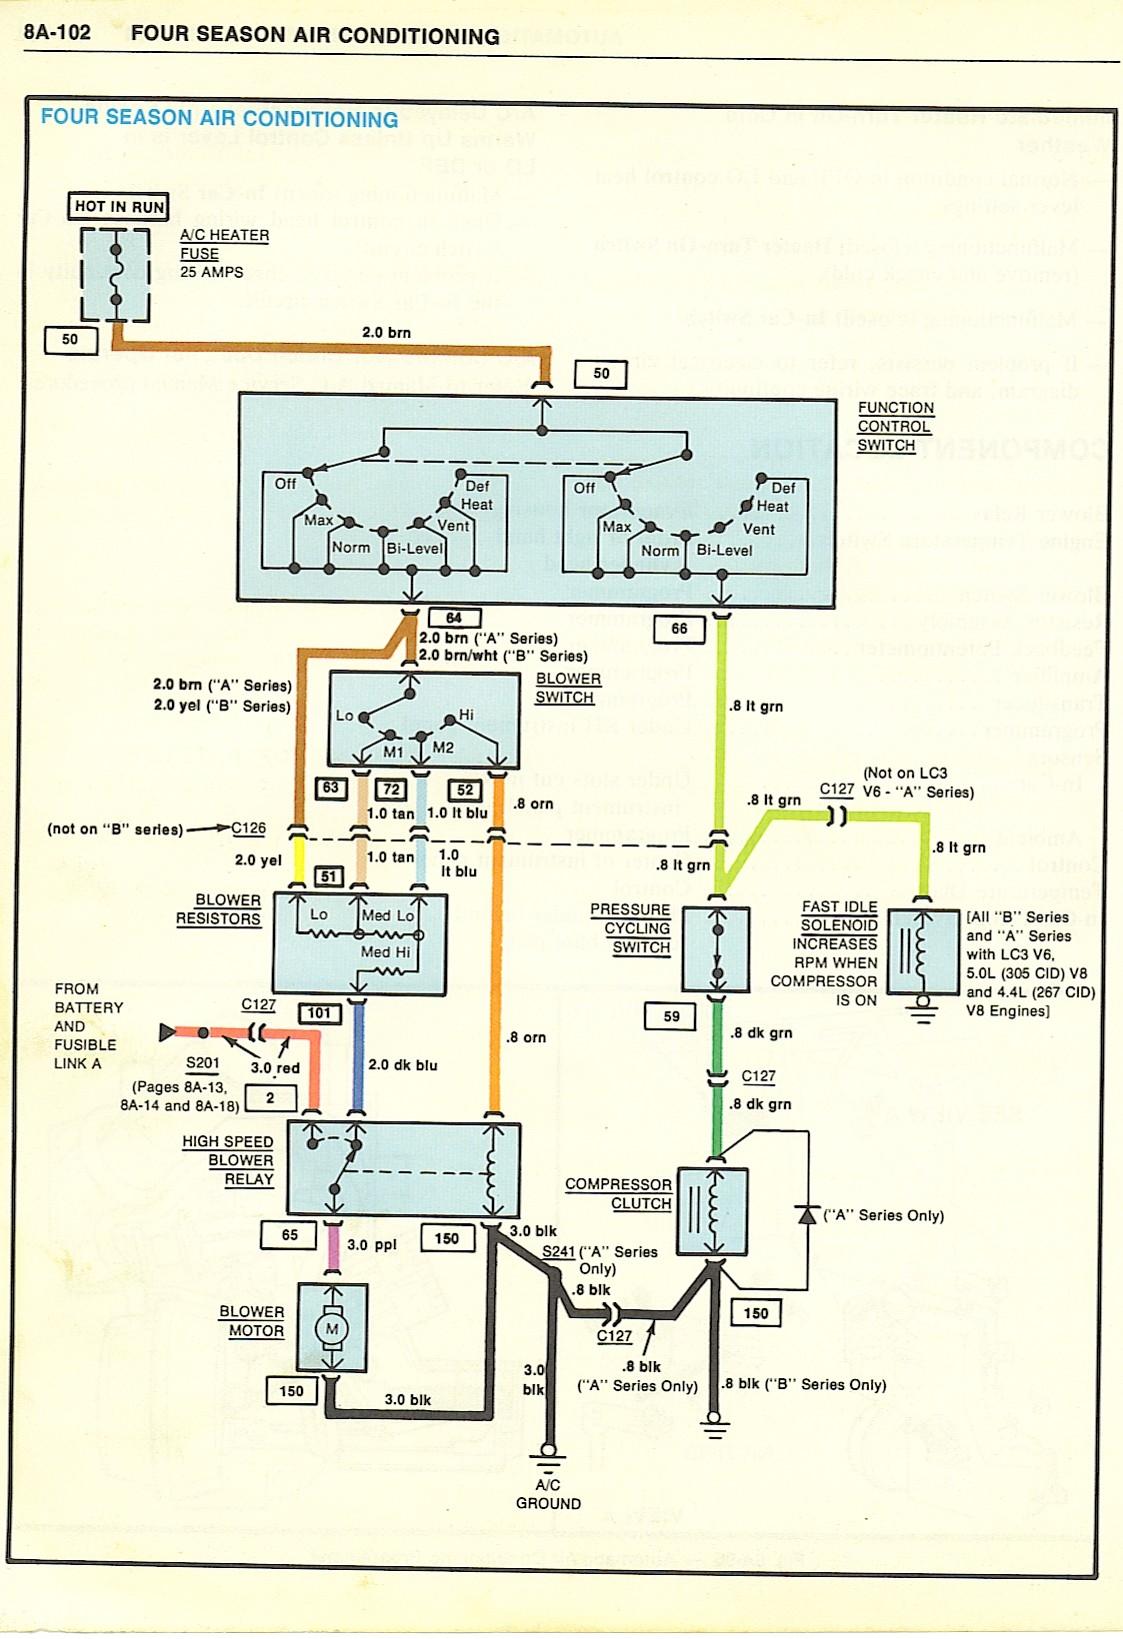 BY_2710] 99 Peterbilt Air Conditioner Wiring Diagram Download Diagram | 99 Peterbilt Air Conditioner Wiring Diagram |  | Venet Proe Gue45 Mohammedshrine Librar Wiring 101